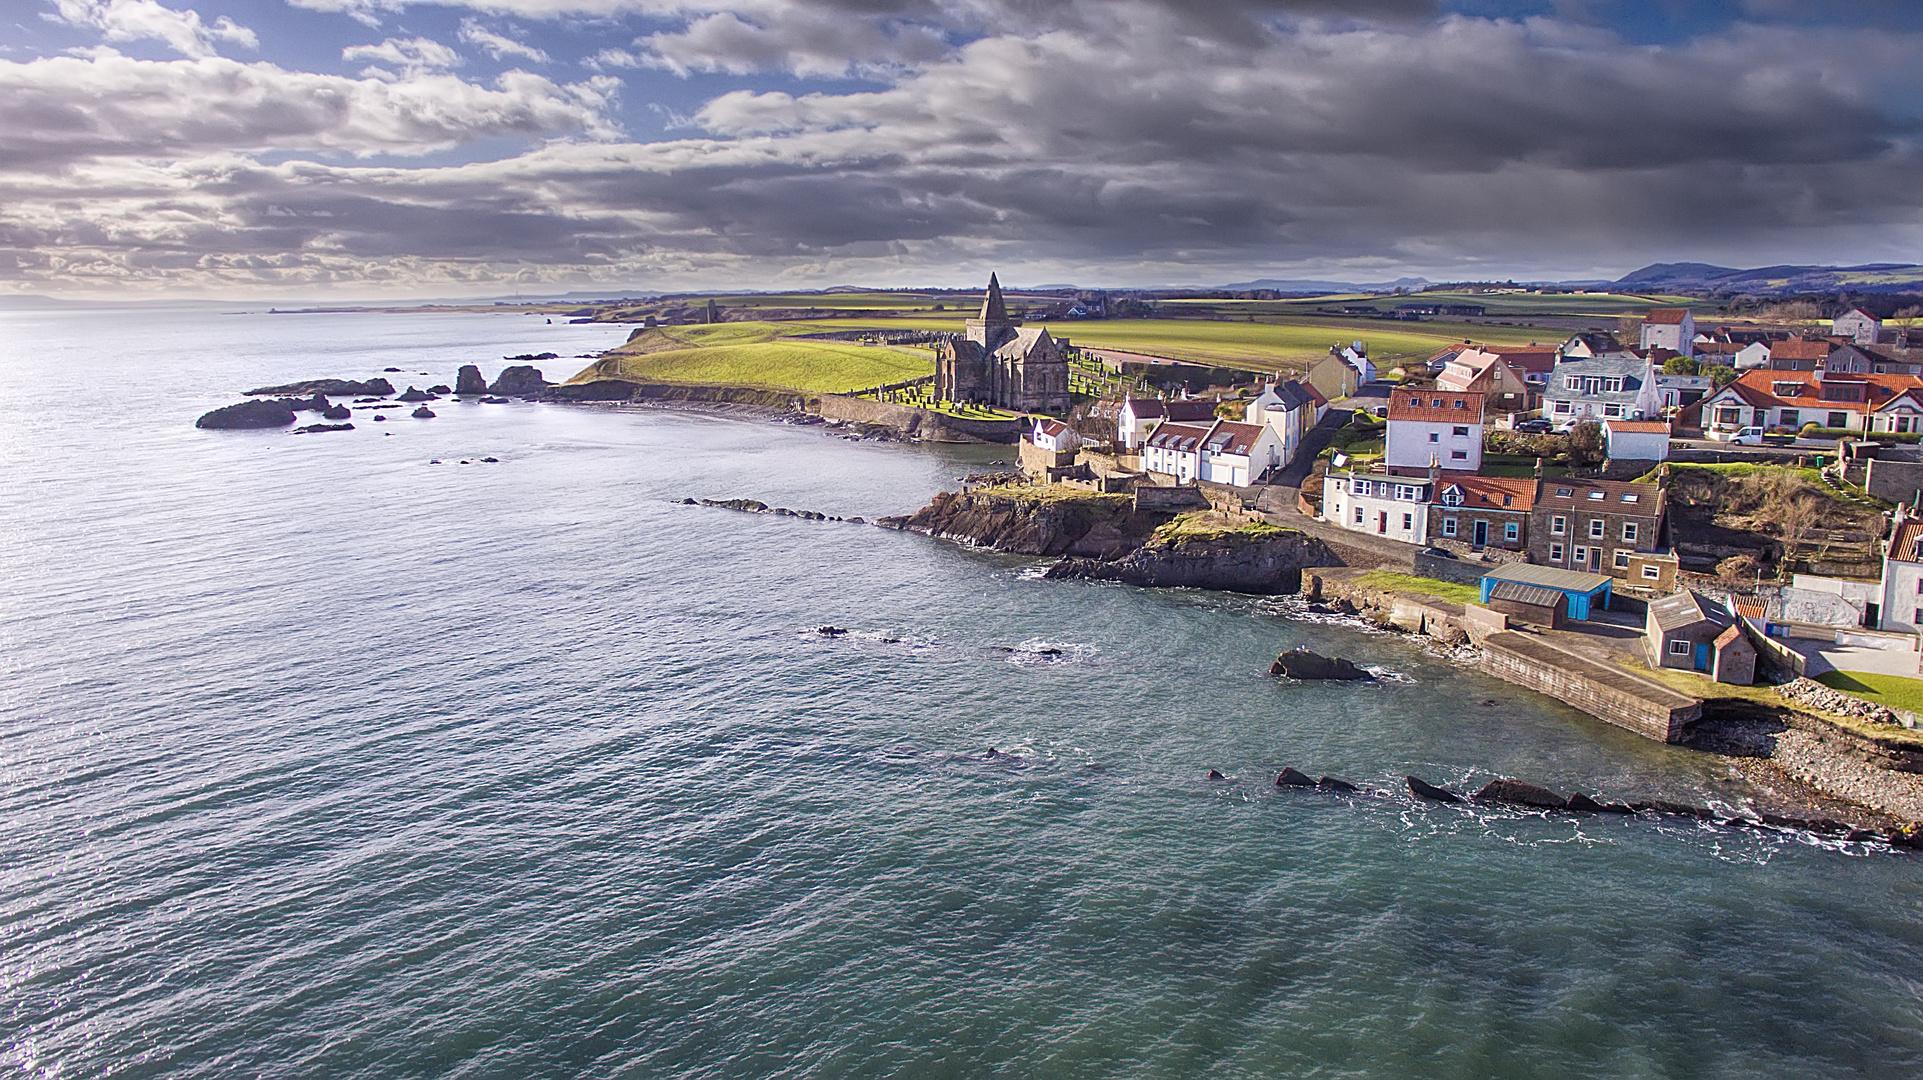 St Monans Fife Scotland